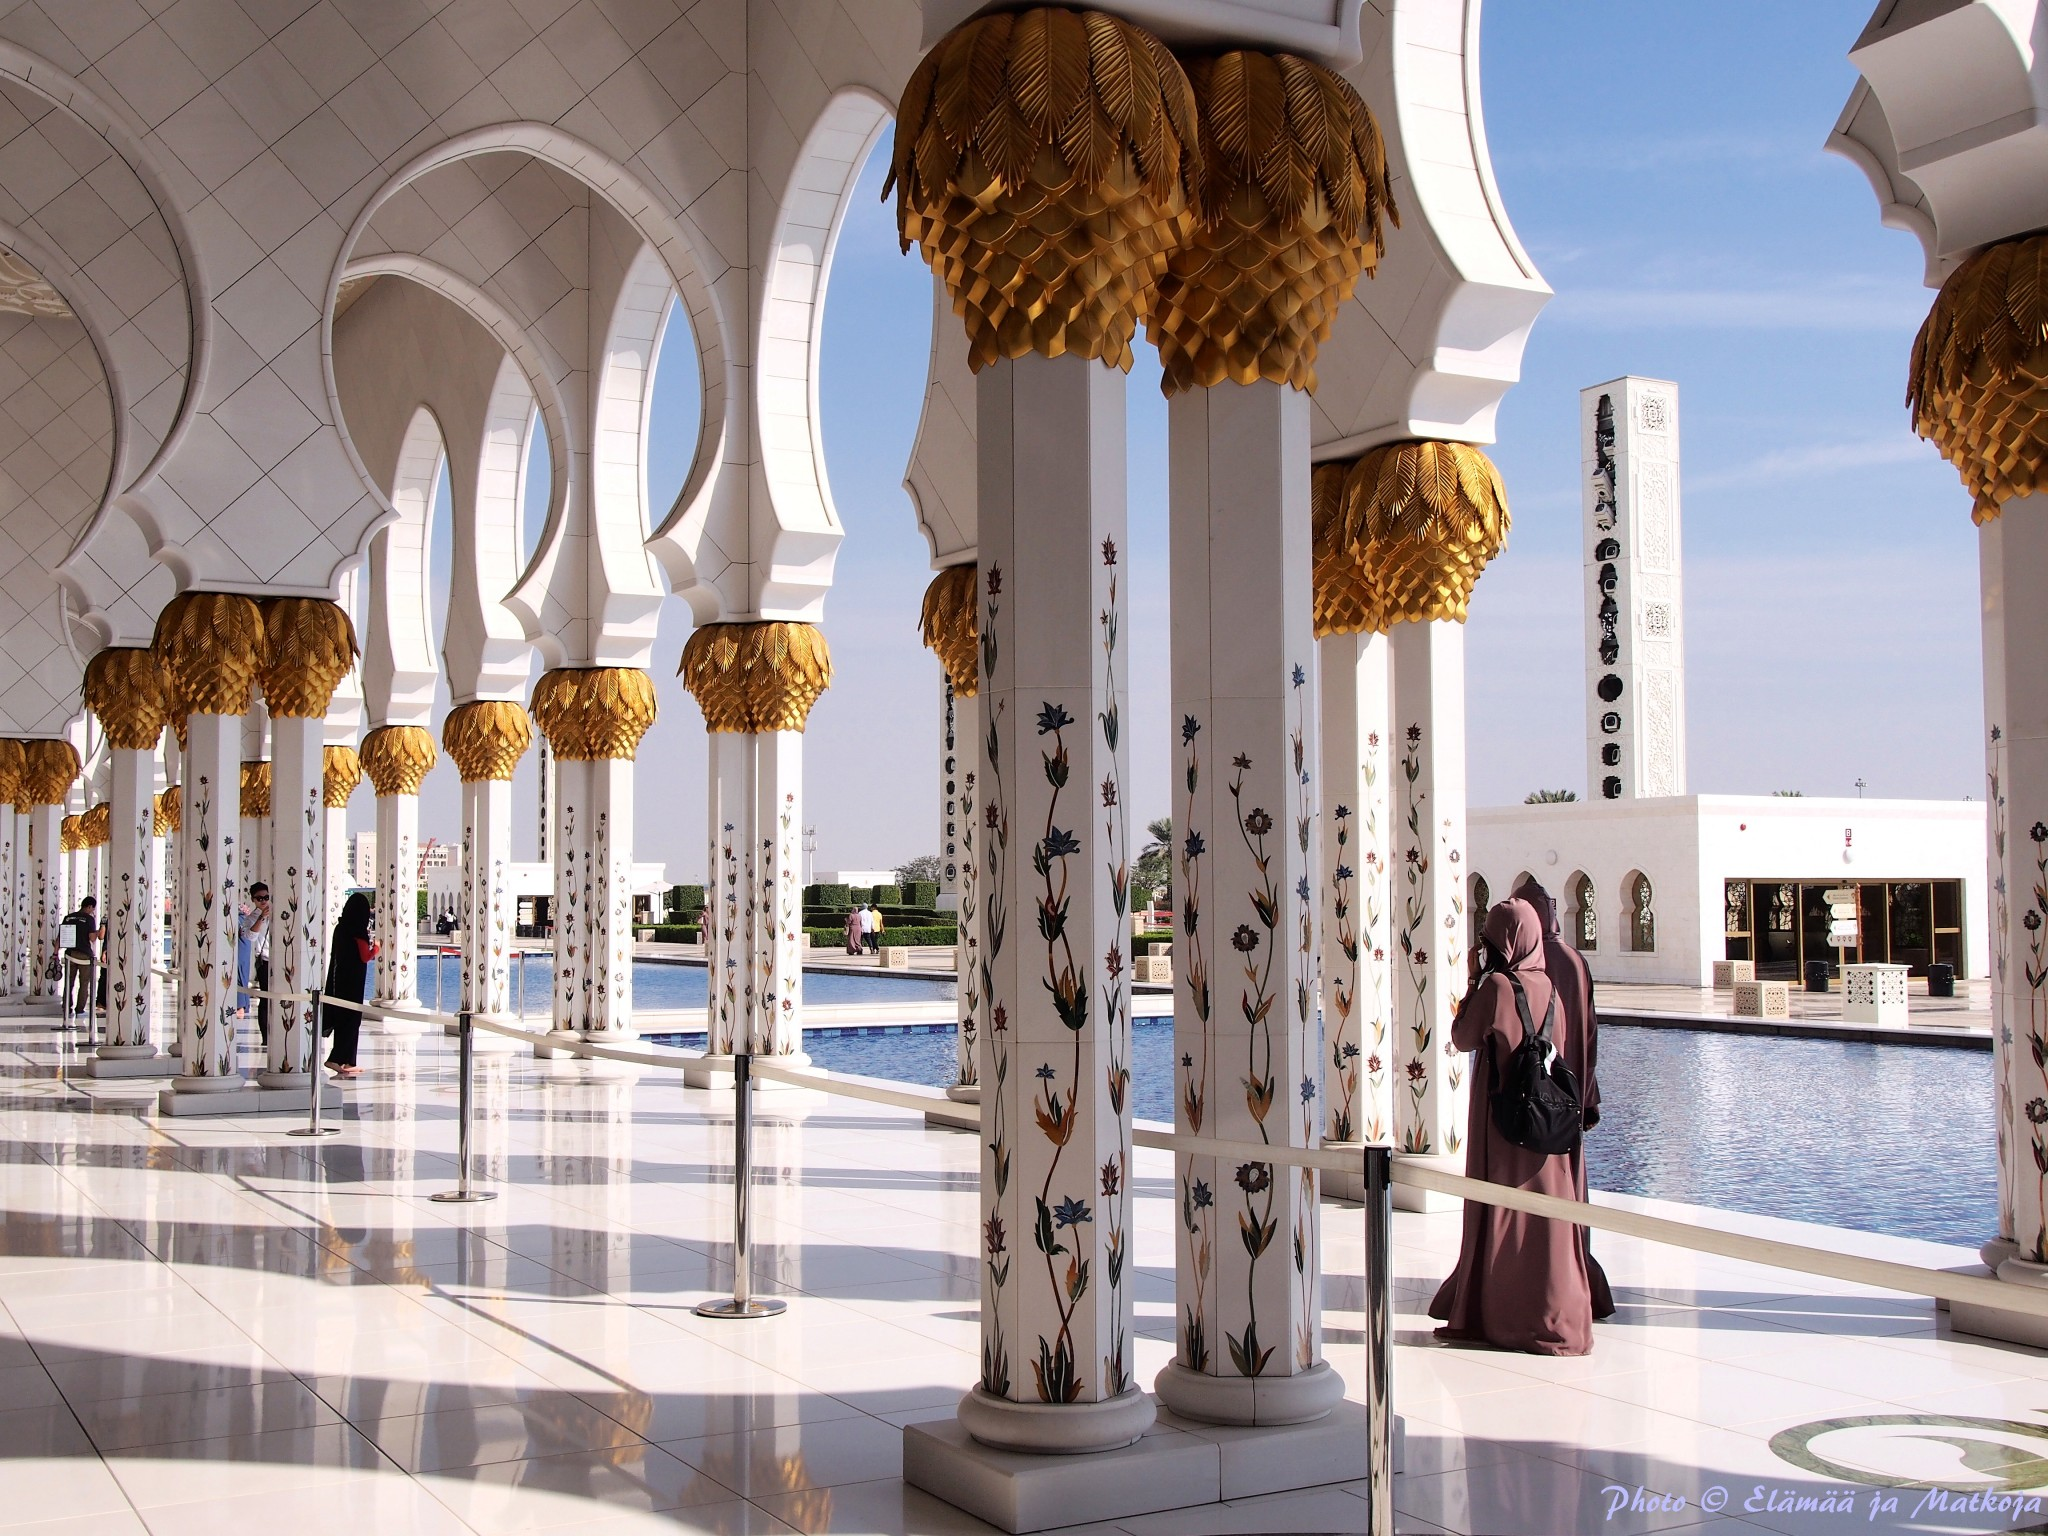 Sheikh Zayed Grand Mosque Abu Dhabi UAE 6 Photo © Elämää ja Matkoja